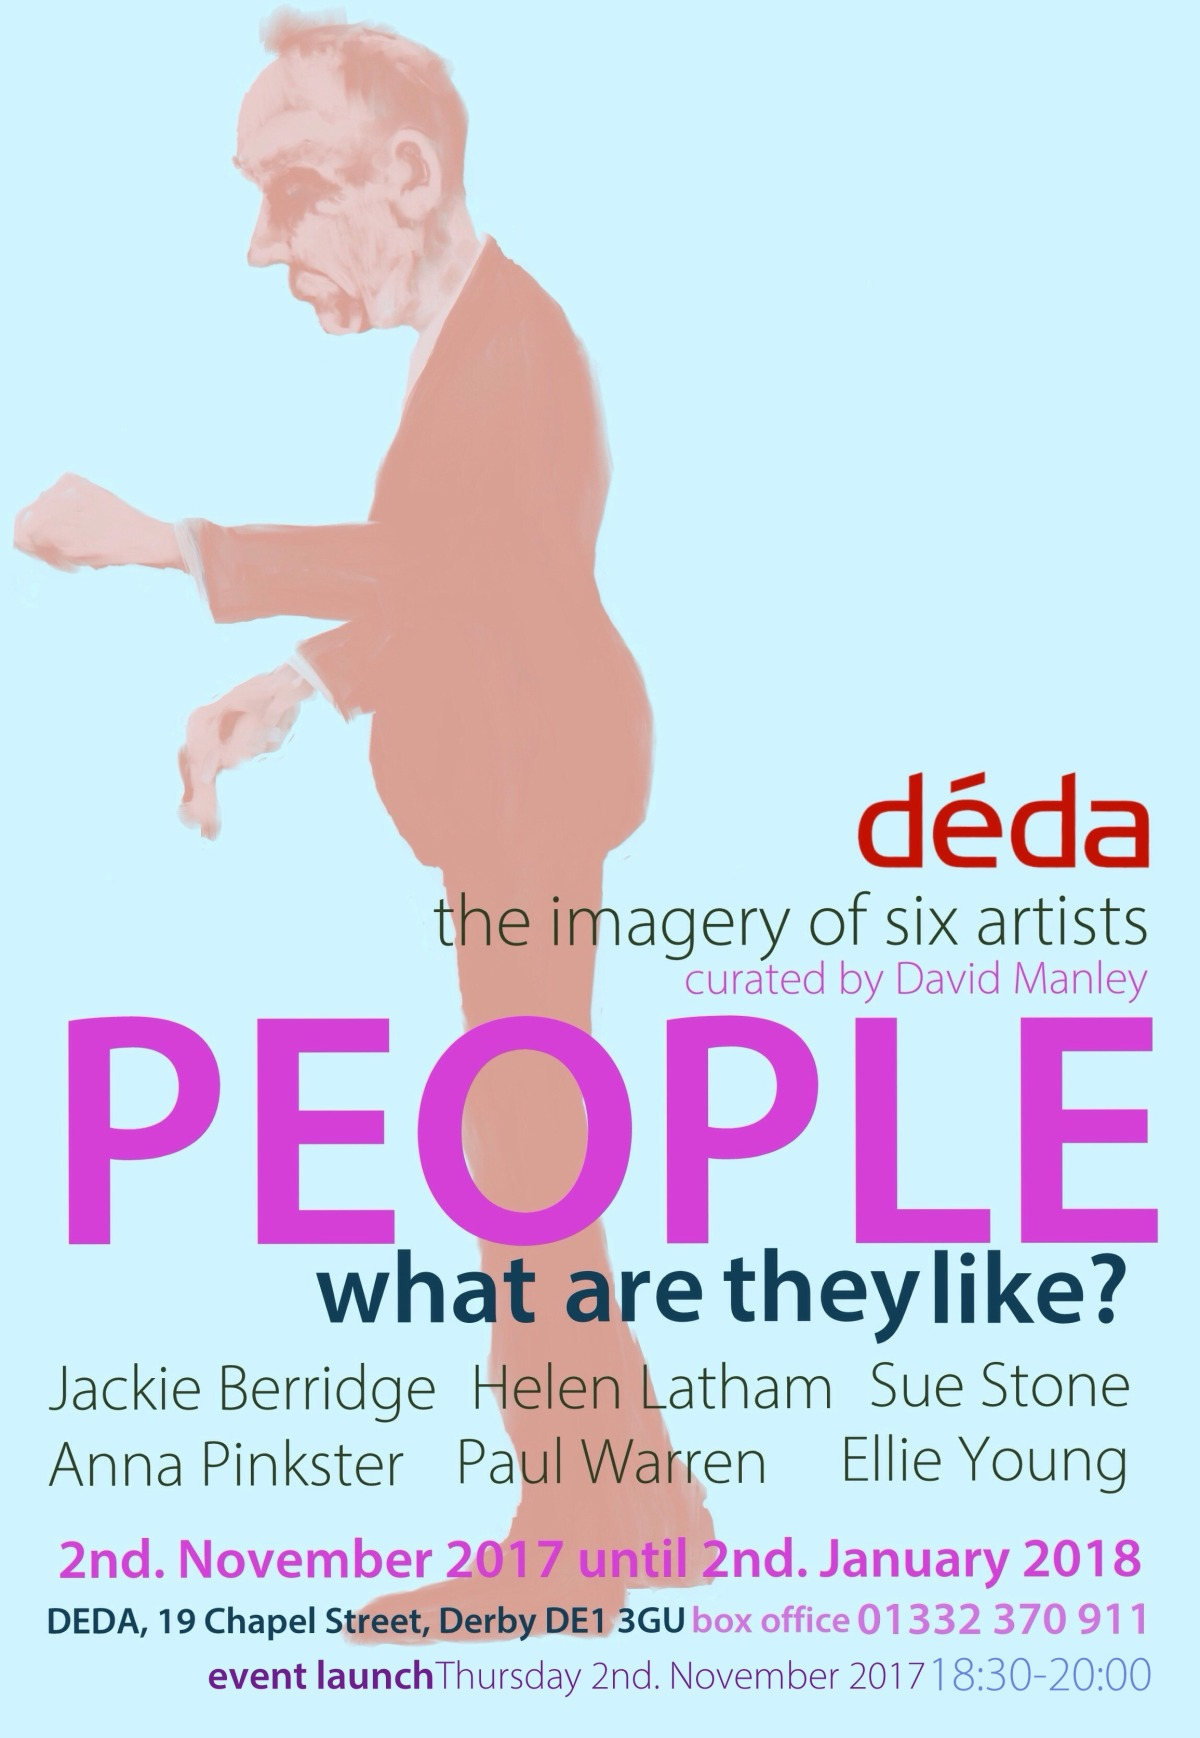 Deda_logo_people_flyer_(2)_26092017-003